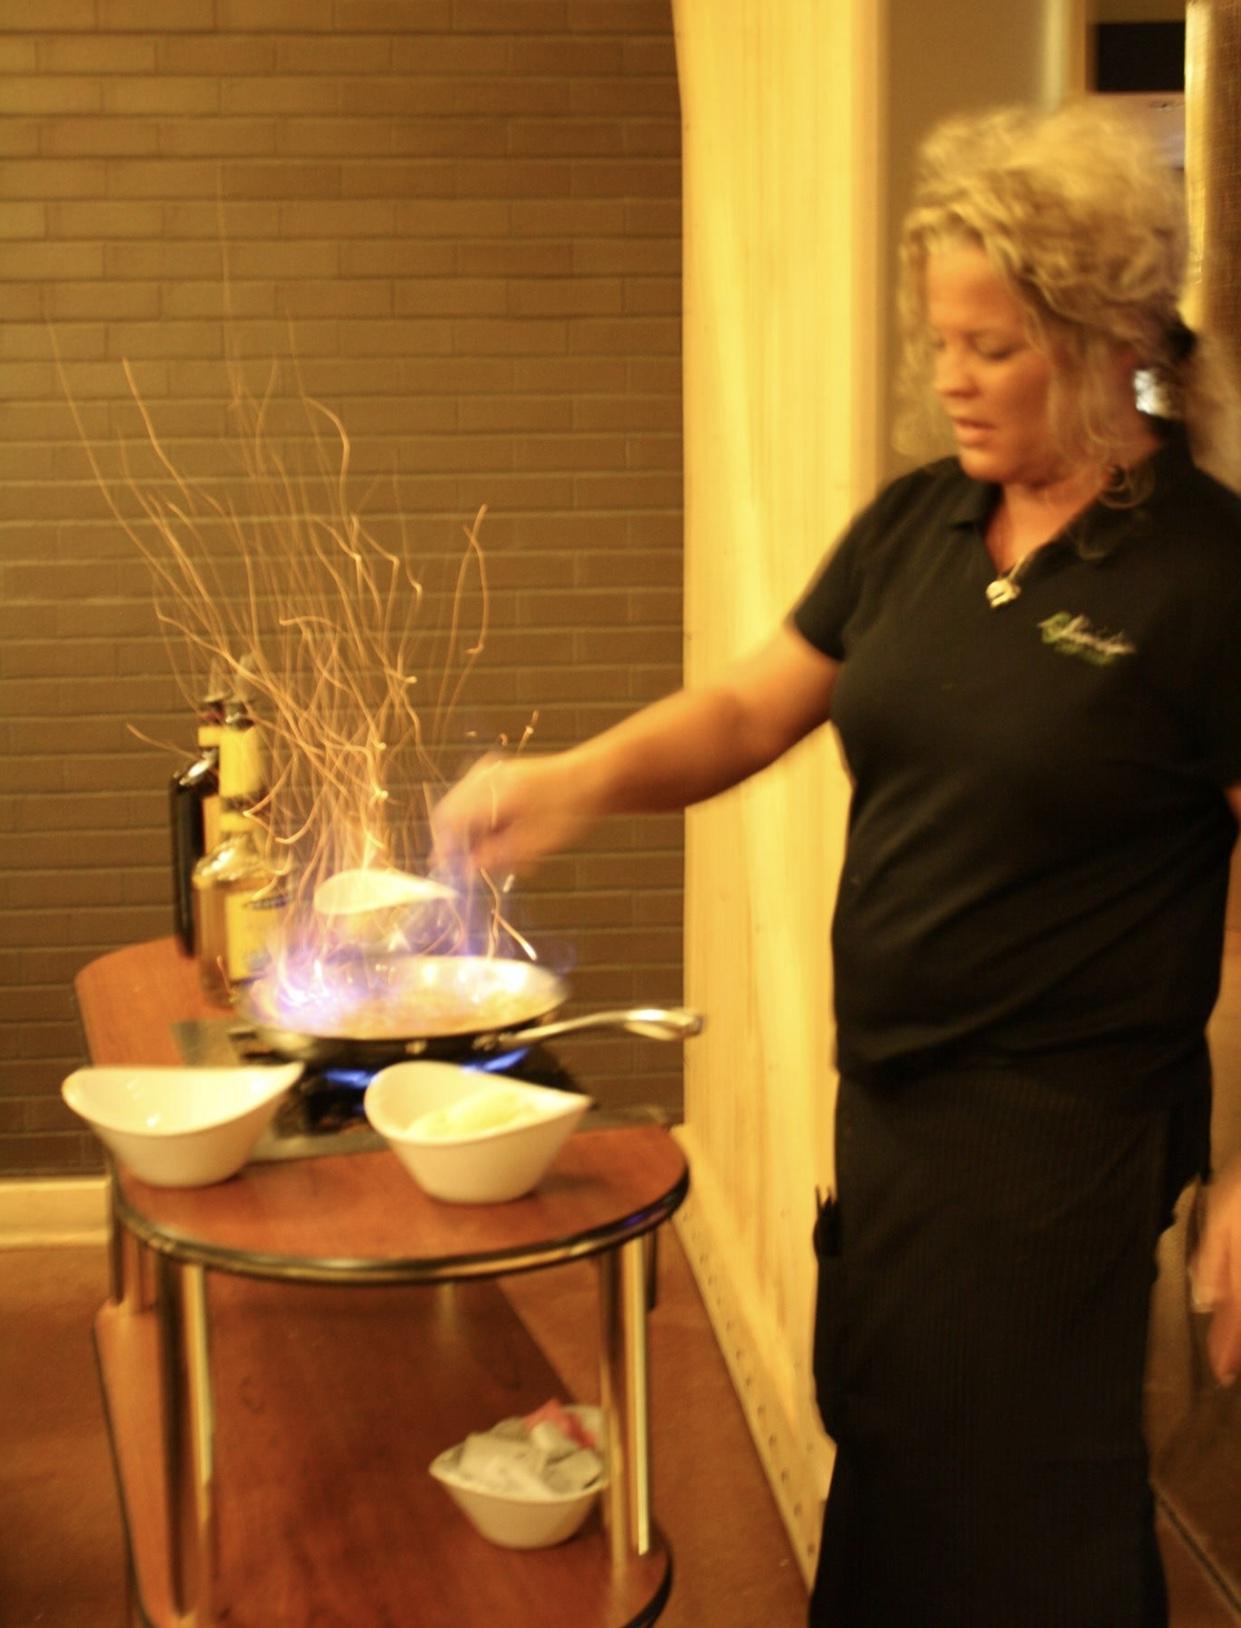 Bananas Foster Flaming Dessert at Olivia's Chop House